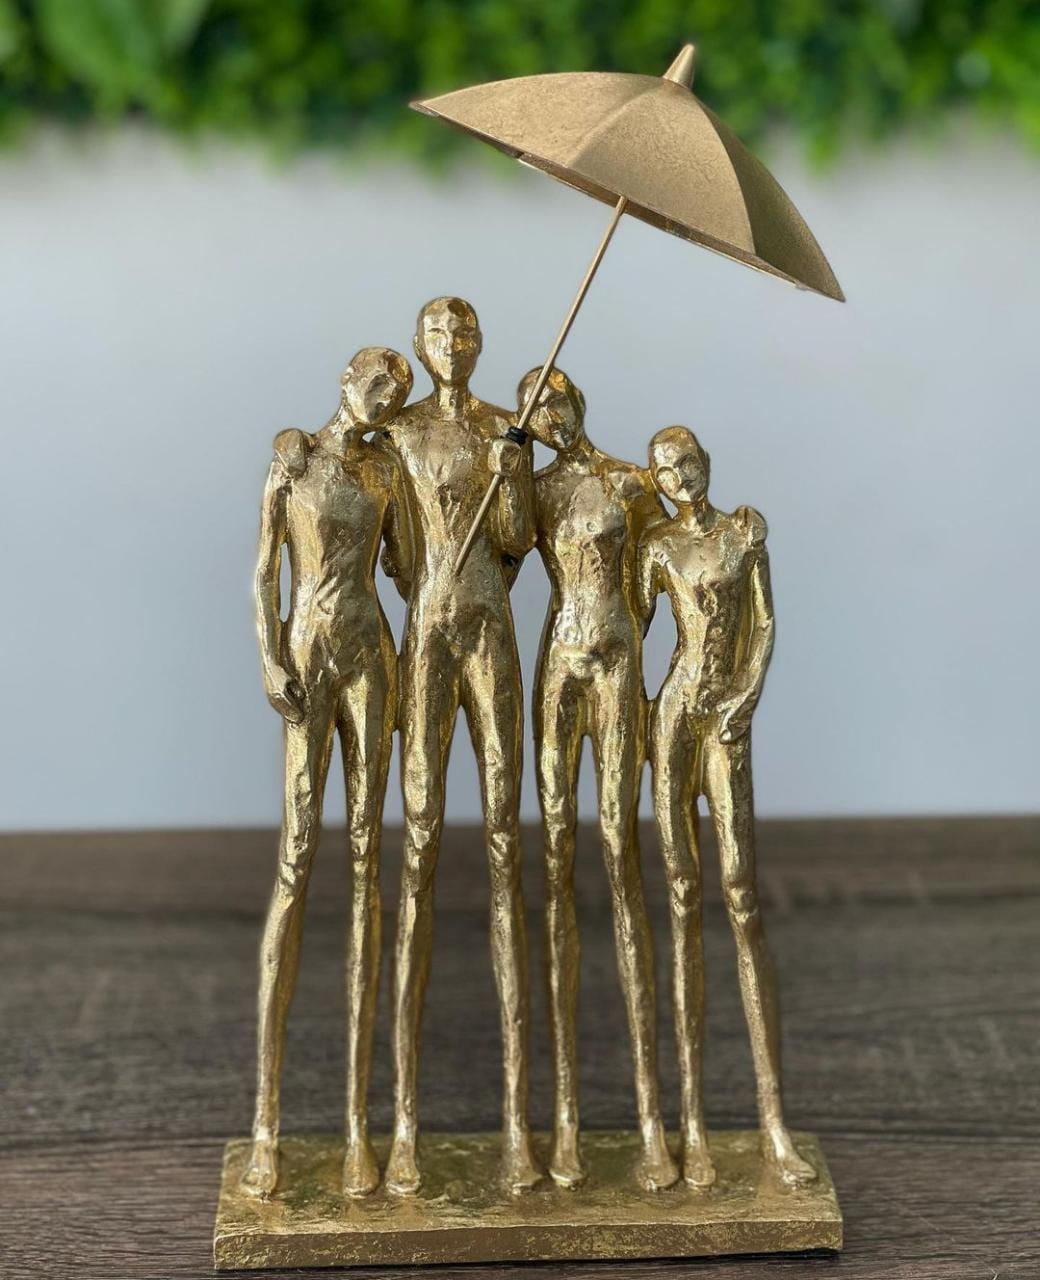 Figura Decorativa Resina Dourada 19x10x28cm